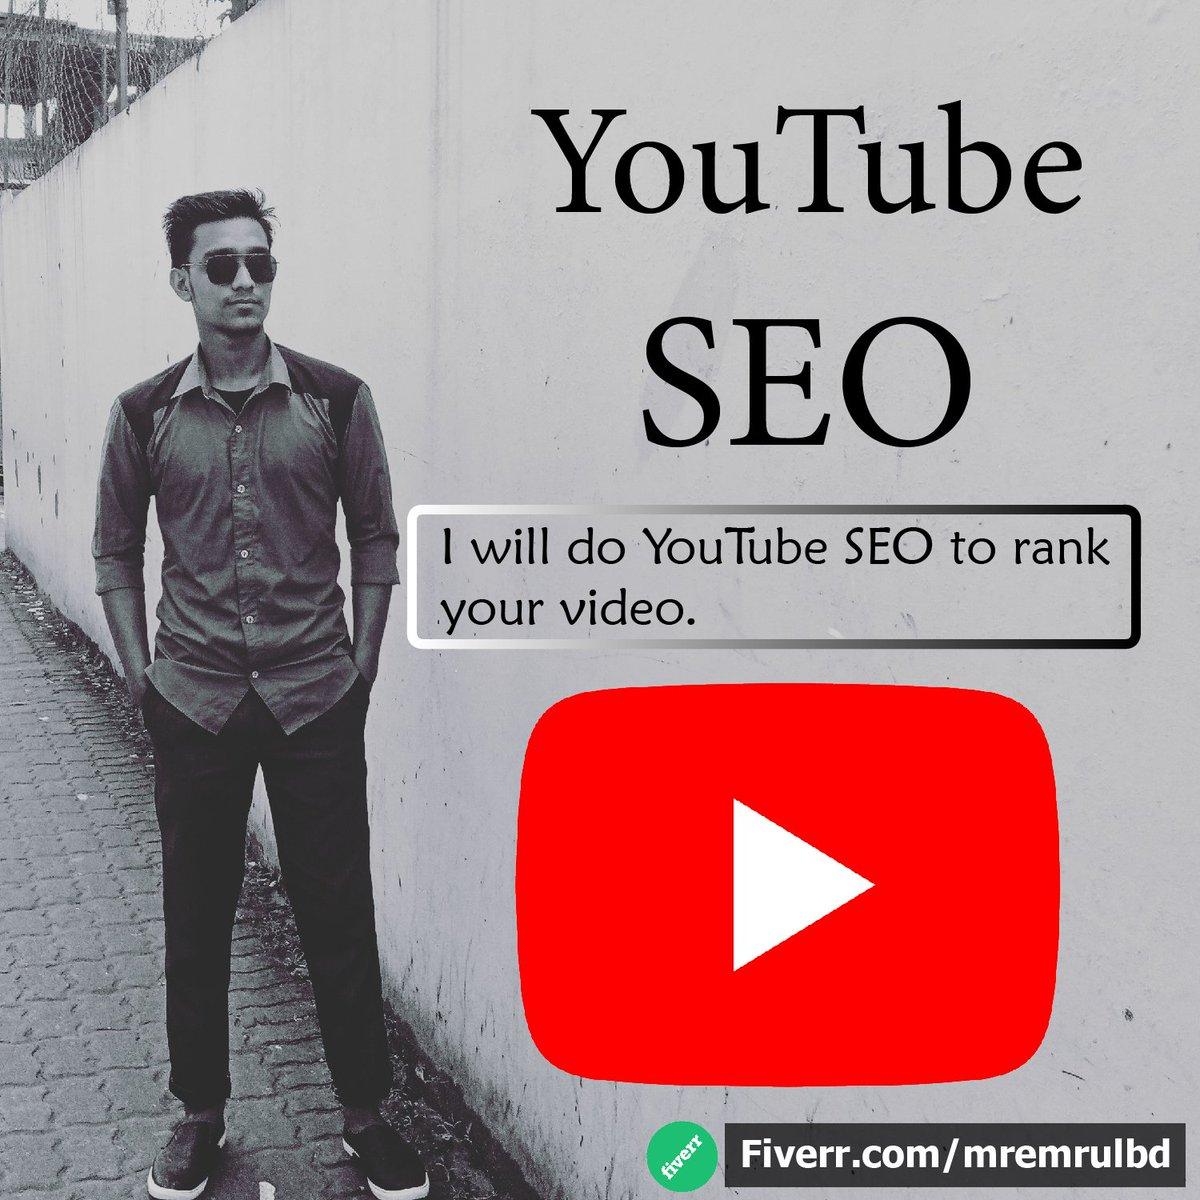 Get 50% Bonus on your first order. #YouTube #youtubechannel #Videos #VideoViral #vid #YouTubers #video #offer #BONUS #channel #SEO #YTB #L4L #Twitter #YouTuber #YouTubeOriginals